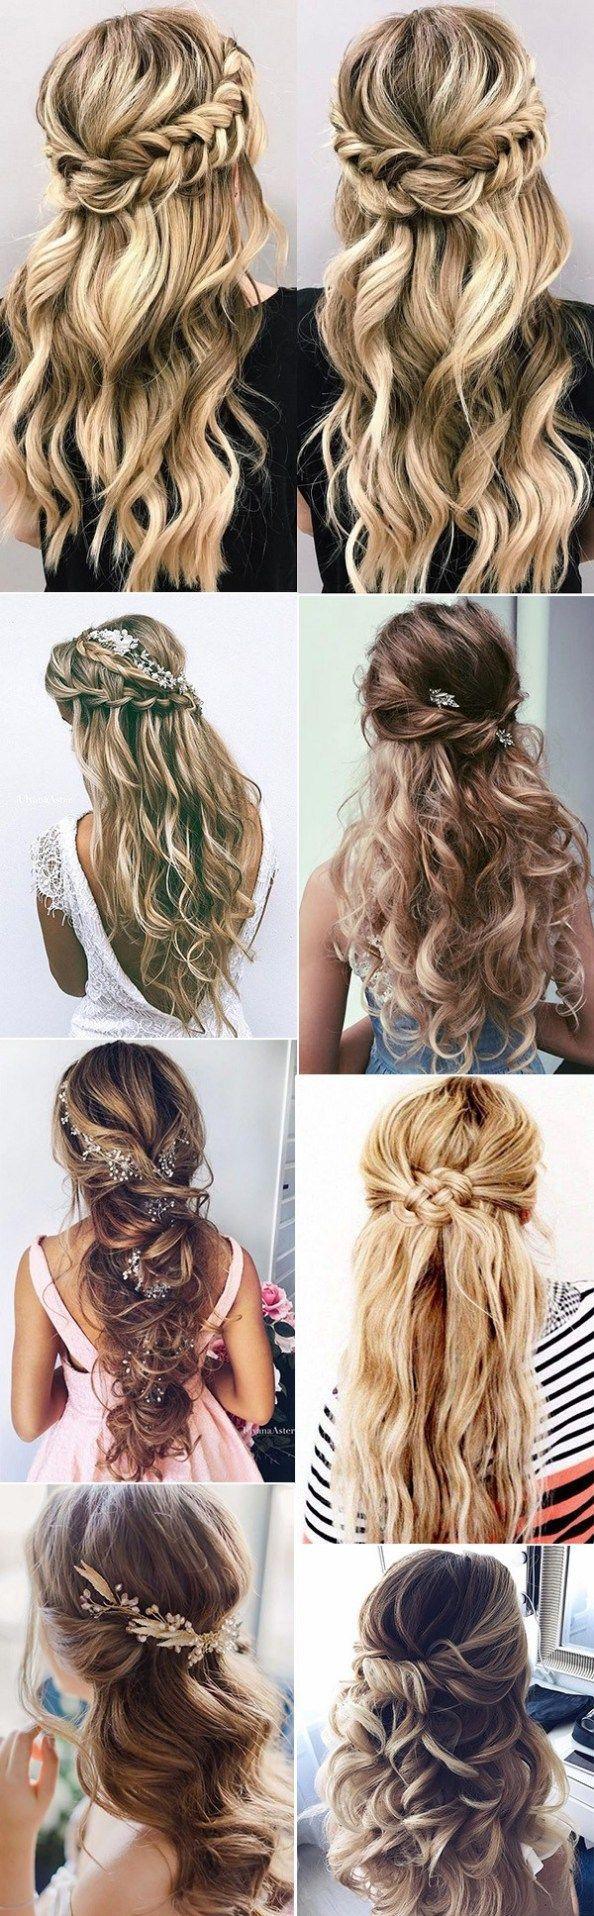 13 schicke halb hoch halb runter Hochzeitsfrisuren für langes Haar